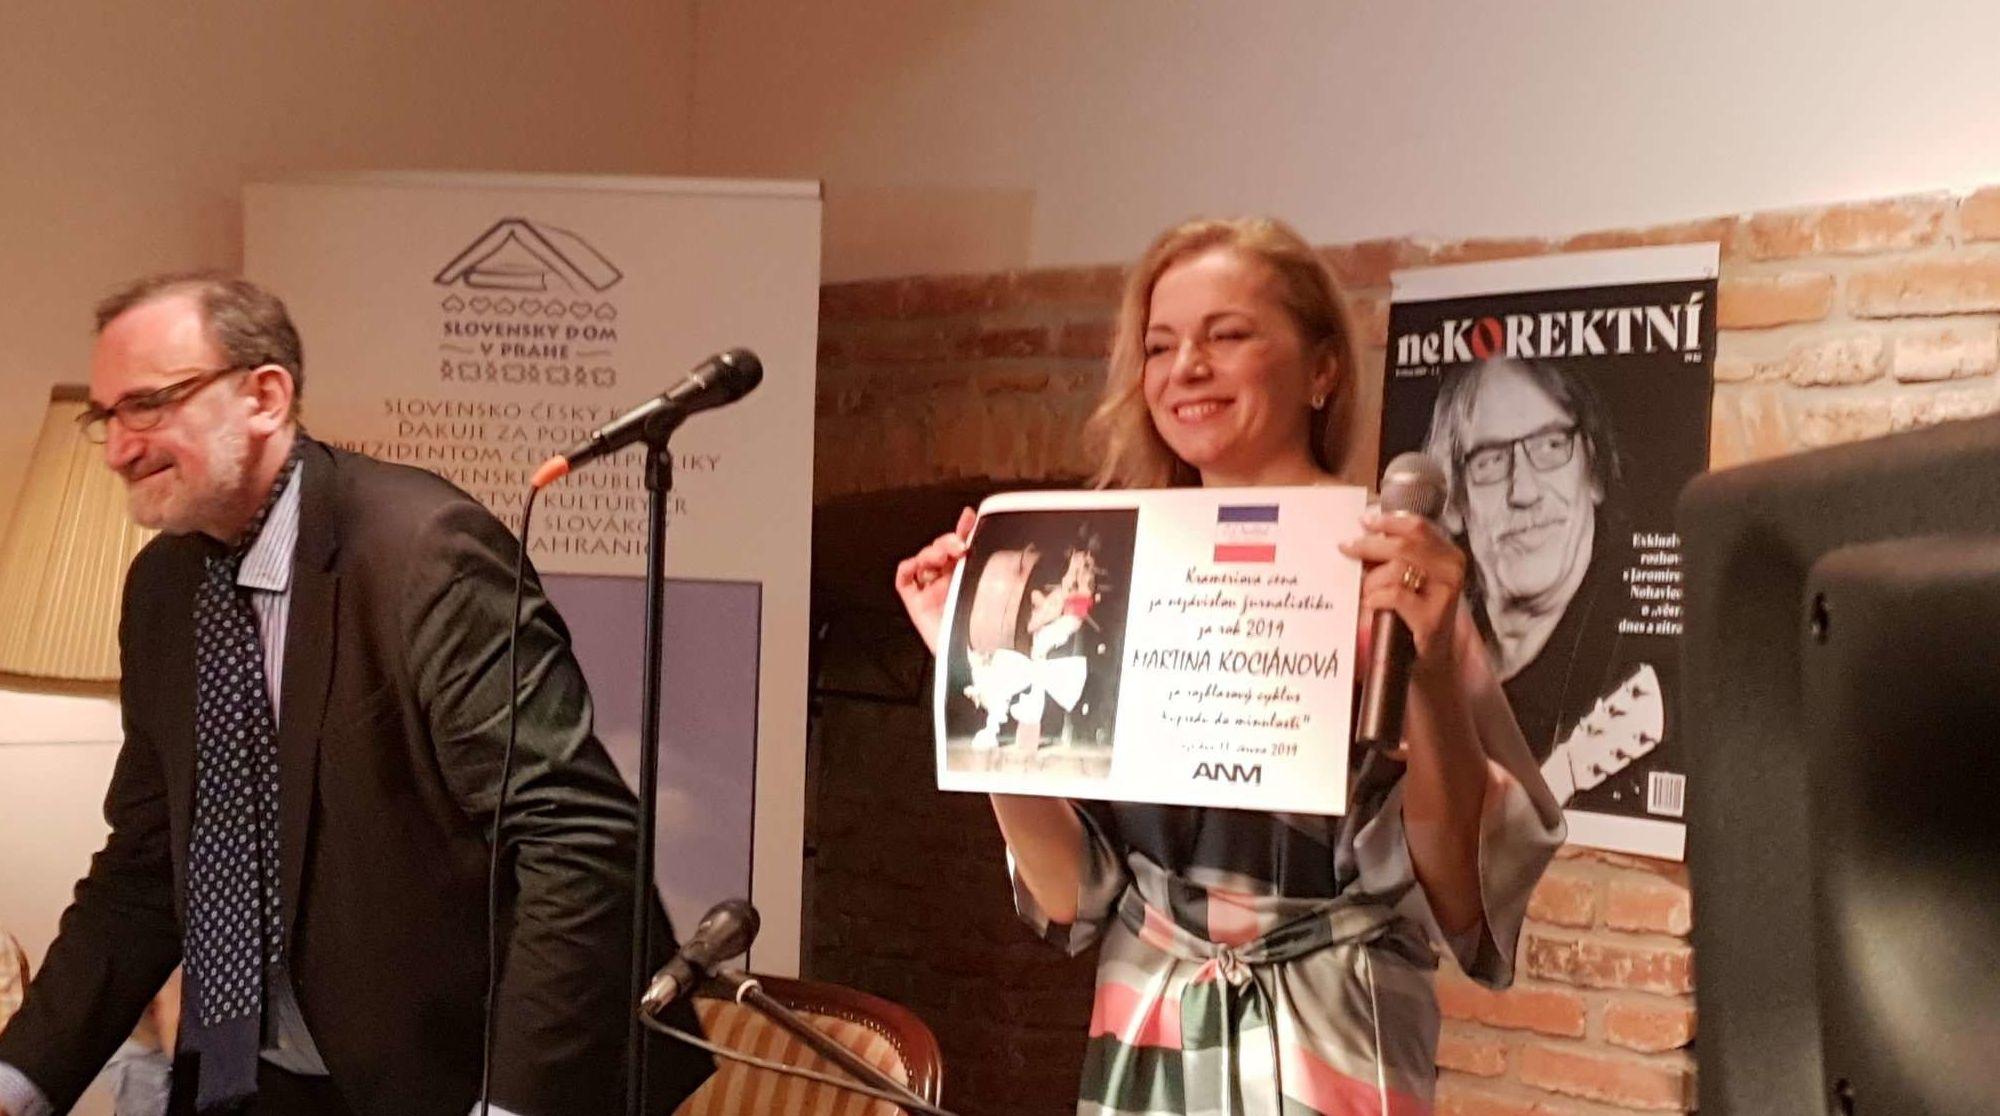 Udílení Krameriovy ceny nezávislým žurnalistům, Slovenský dům, Praha 2019